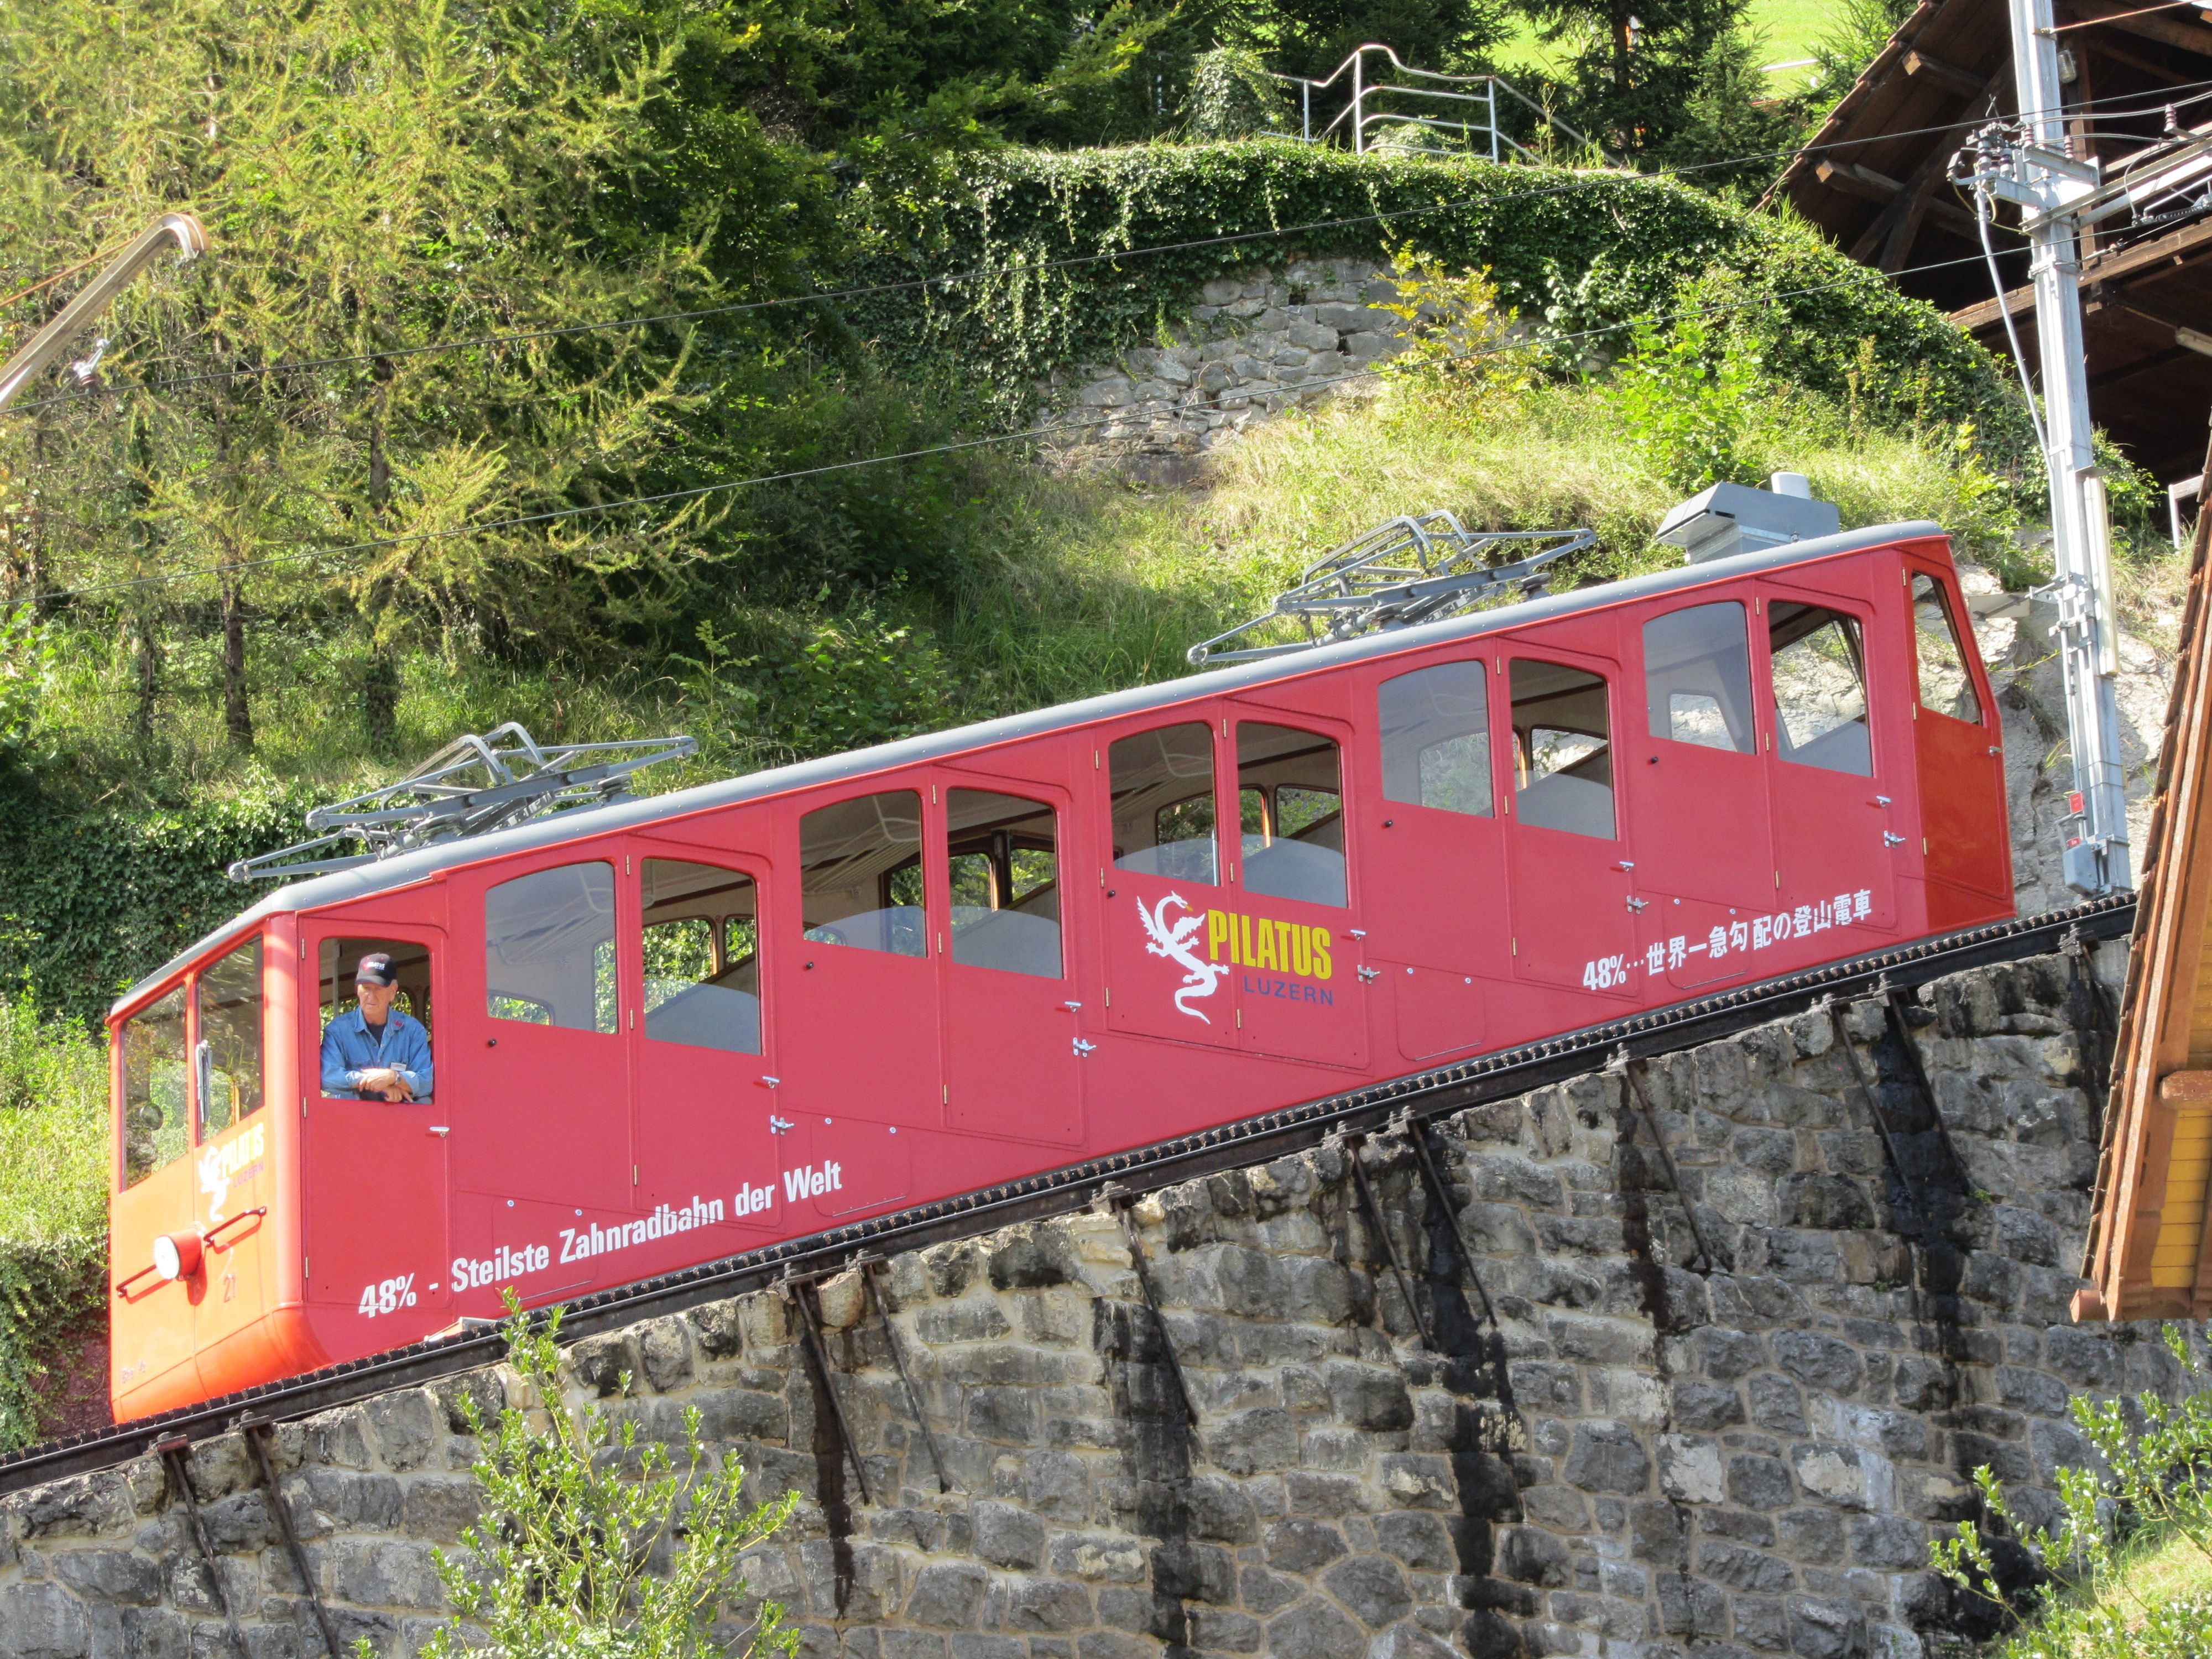 Steepest Cogwheel Train In The World Enroute To Mt Pilatus Photo Credit Sonja Holverson Train European Tour Europe Travel